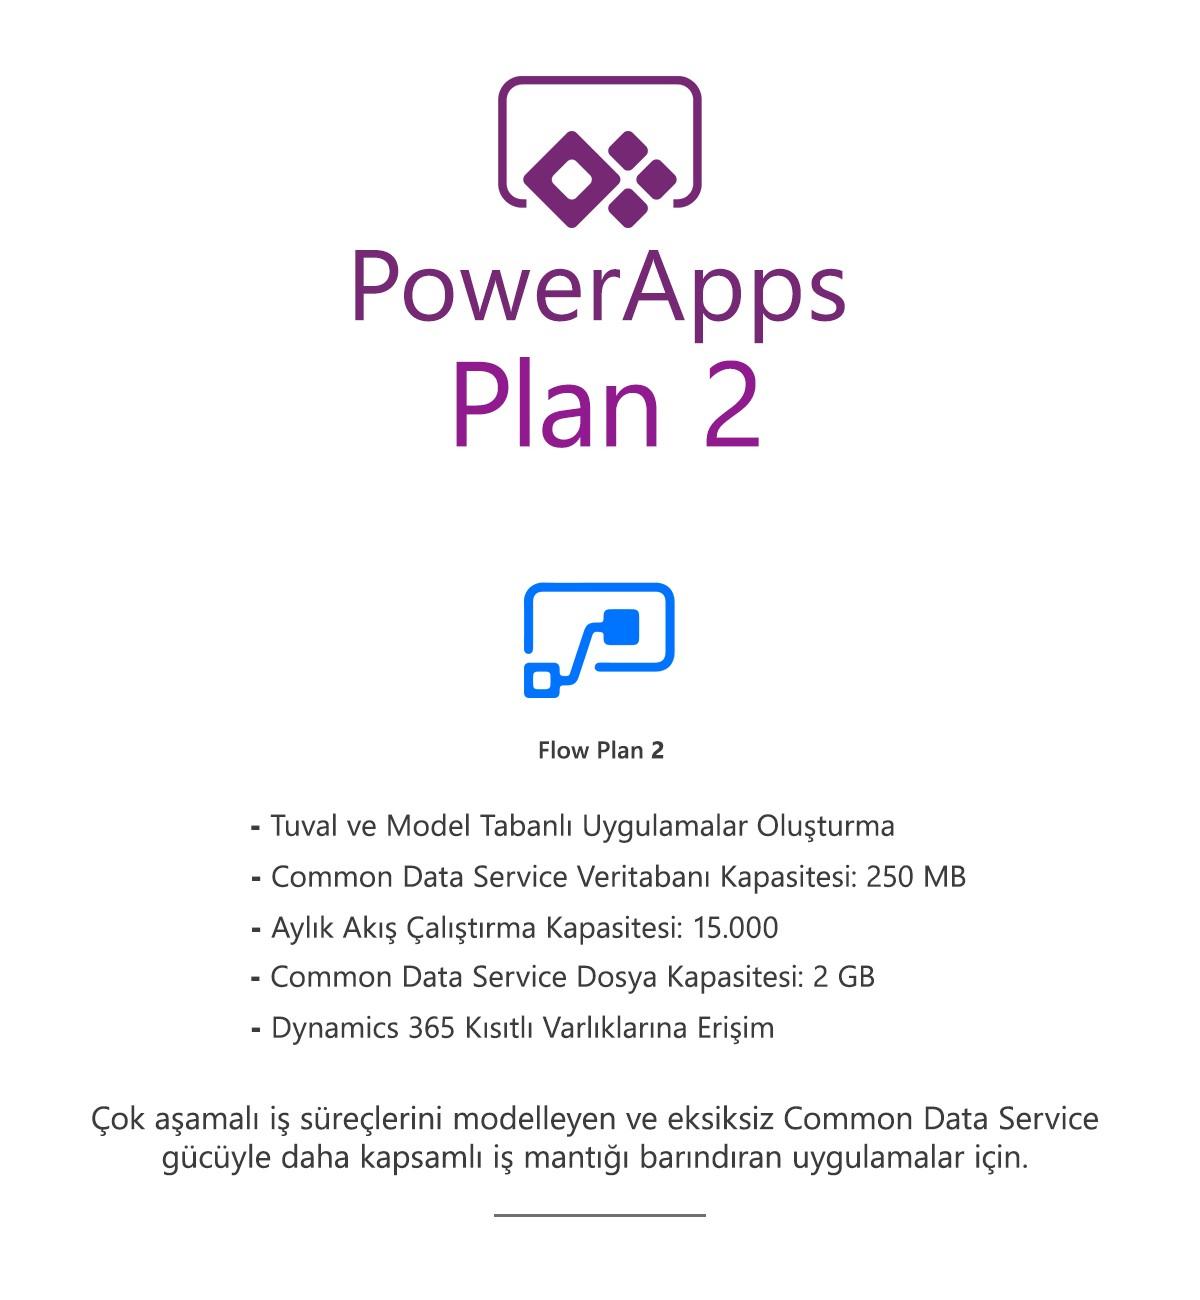 PowerApps Plan 2